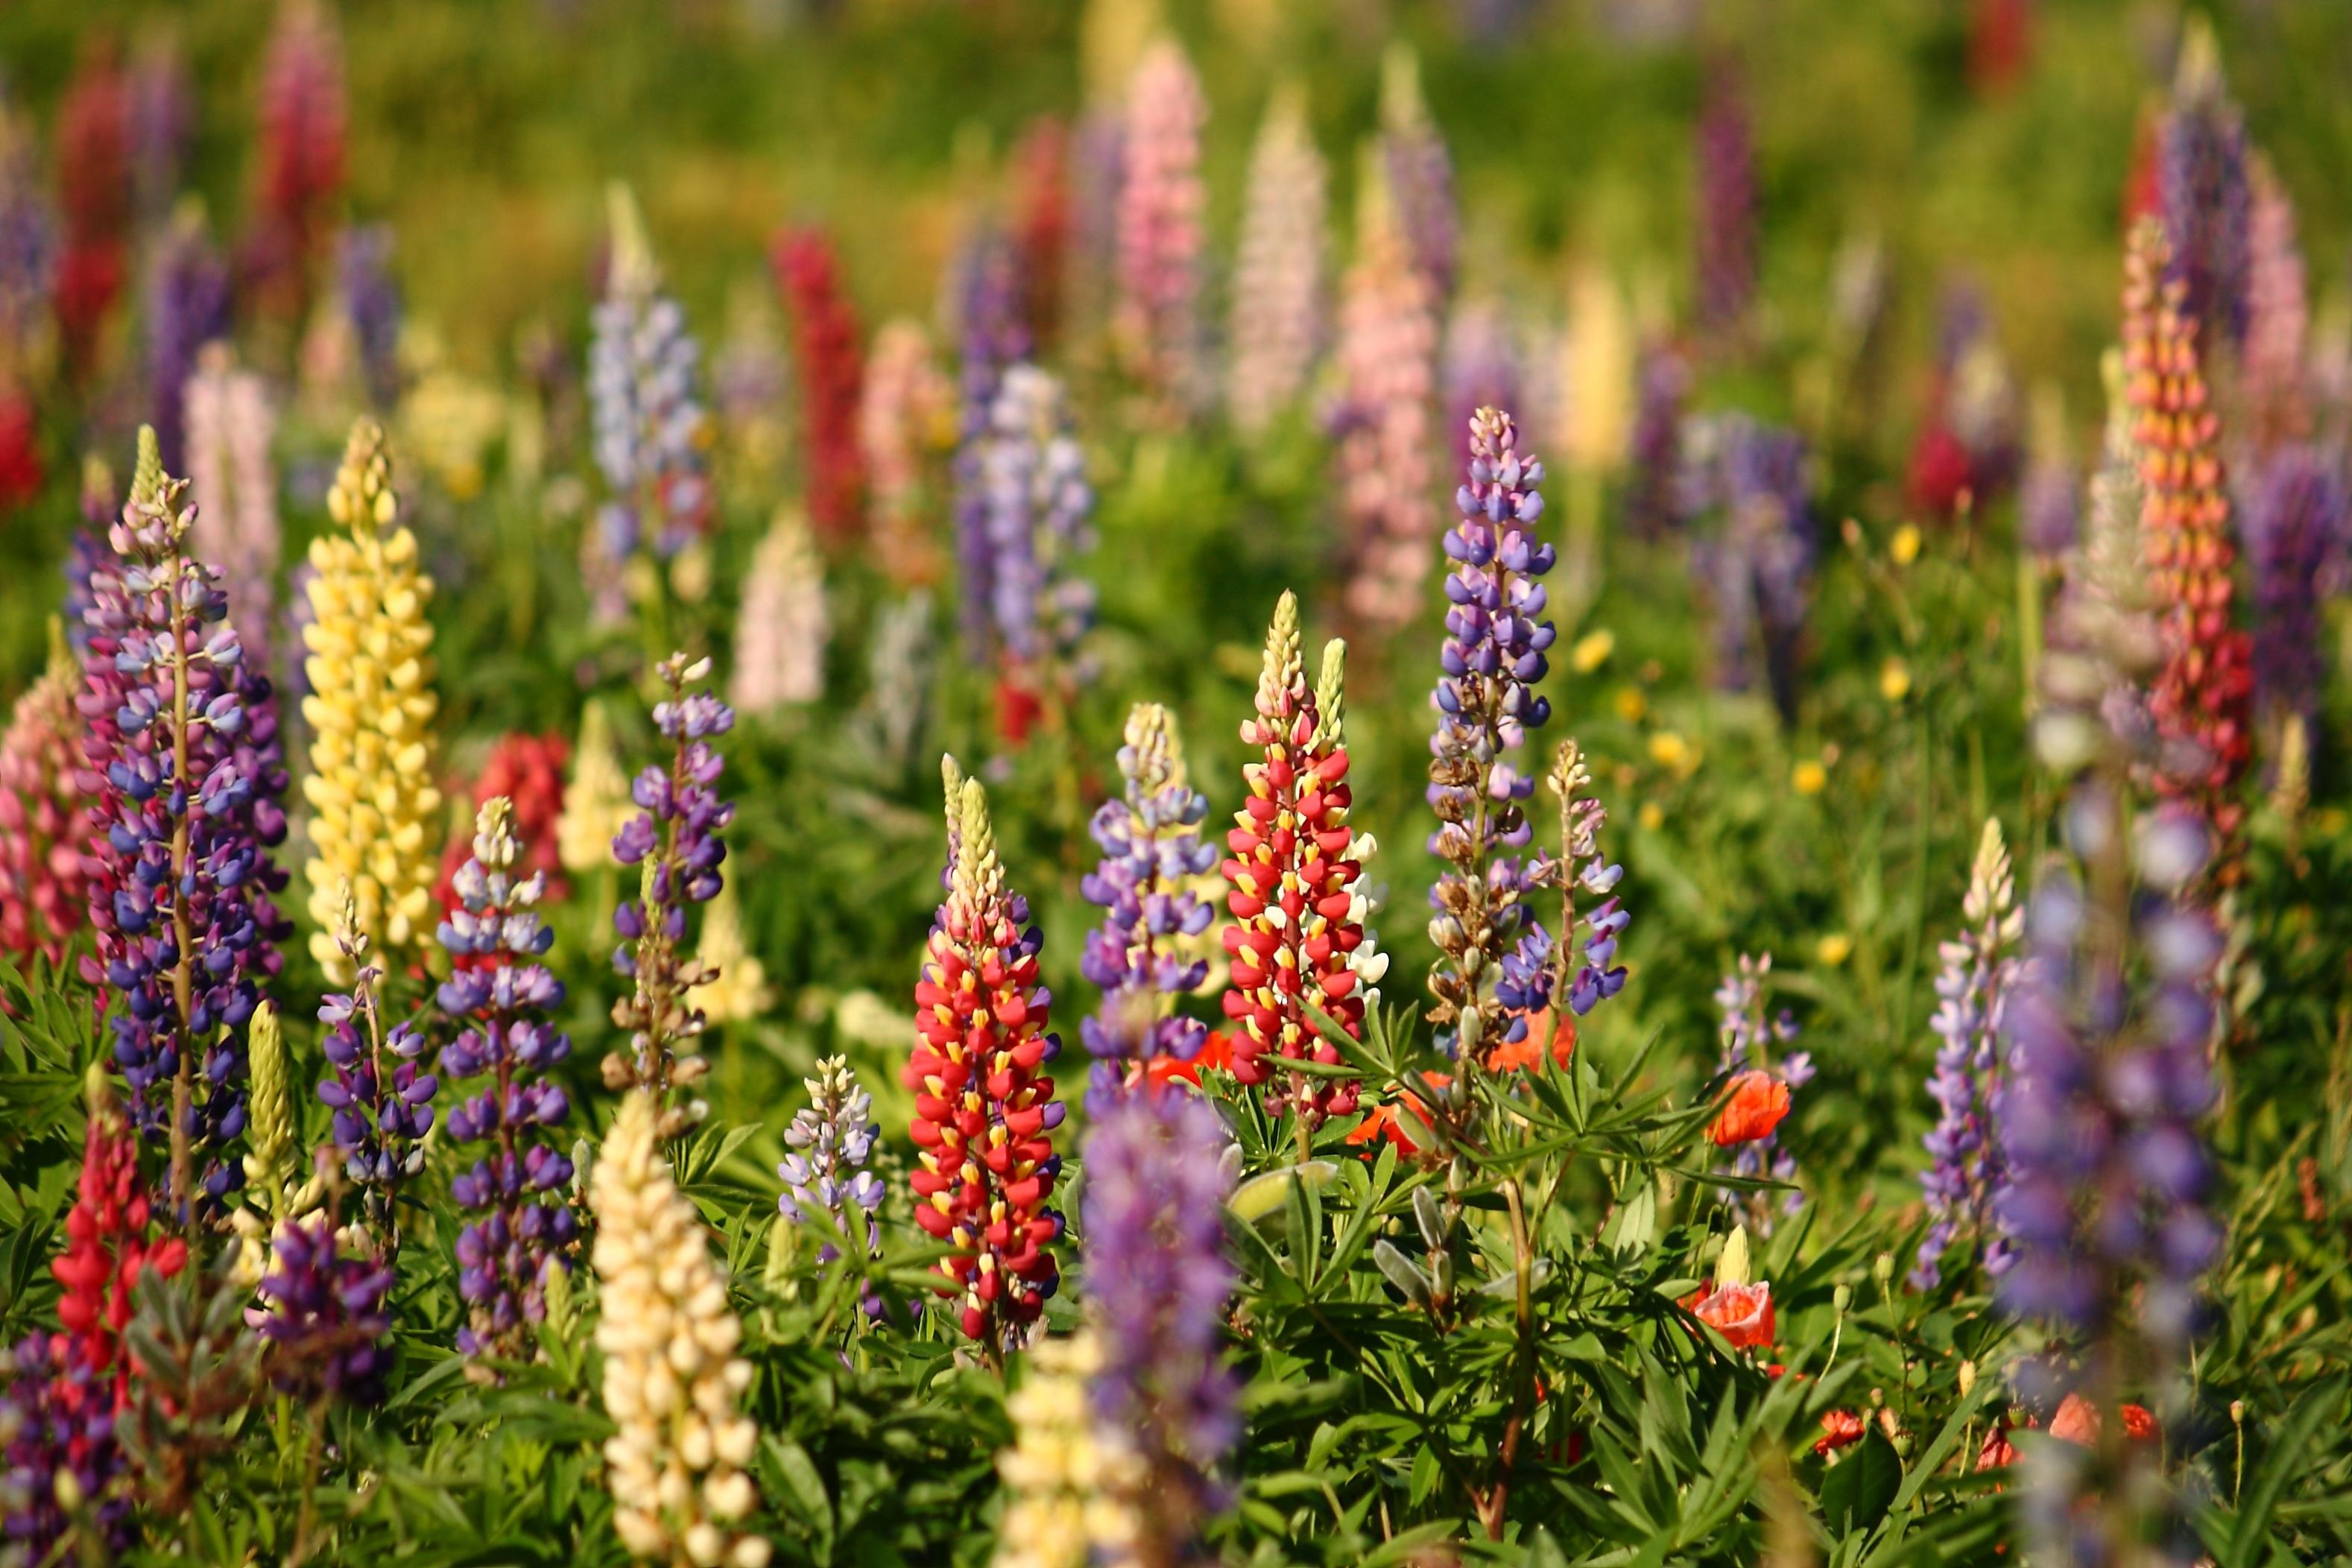 Images Gratuites Prairie Fleur Ete Naturel Botanique Flore